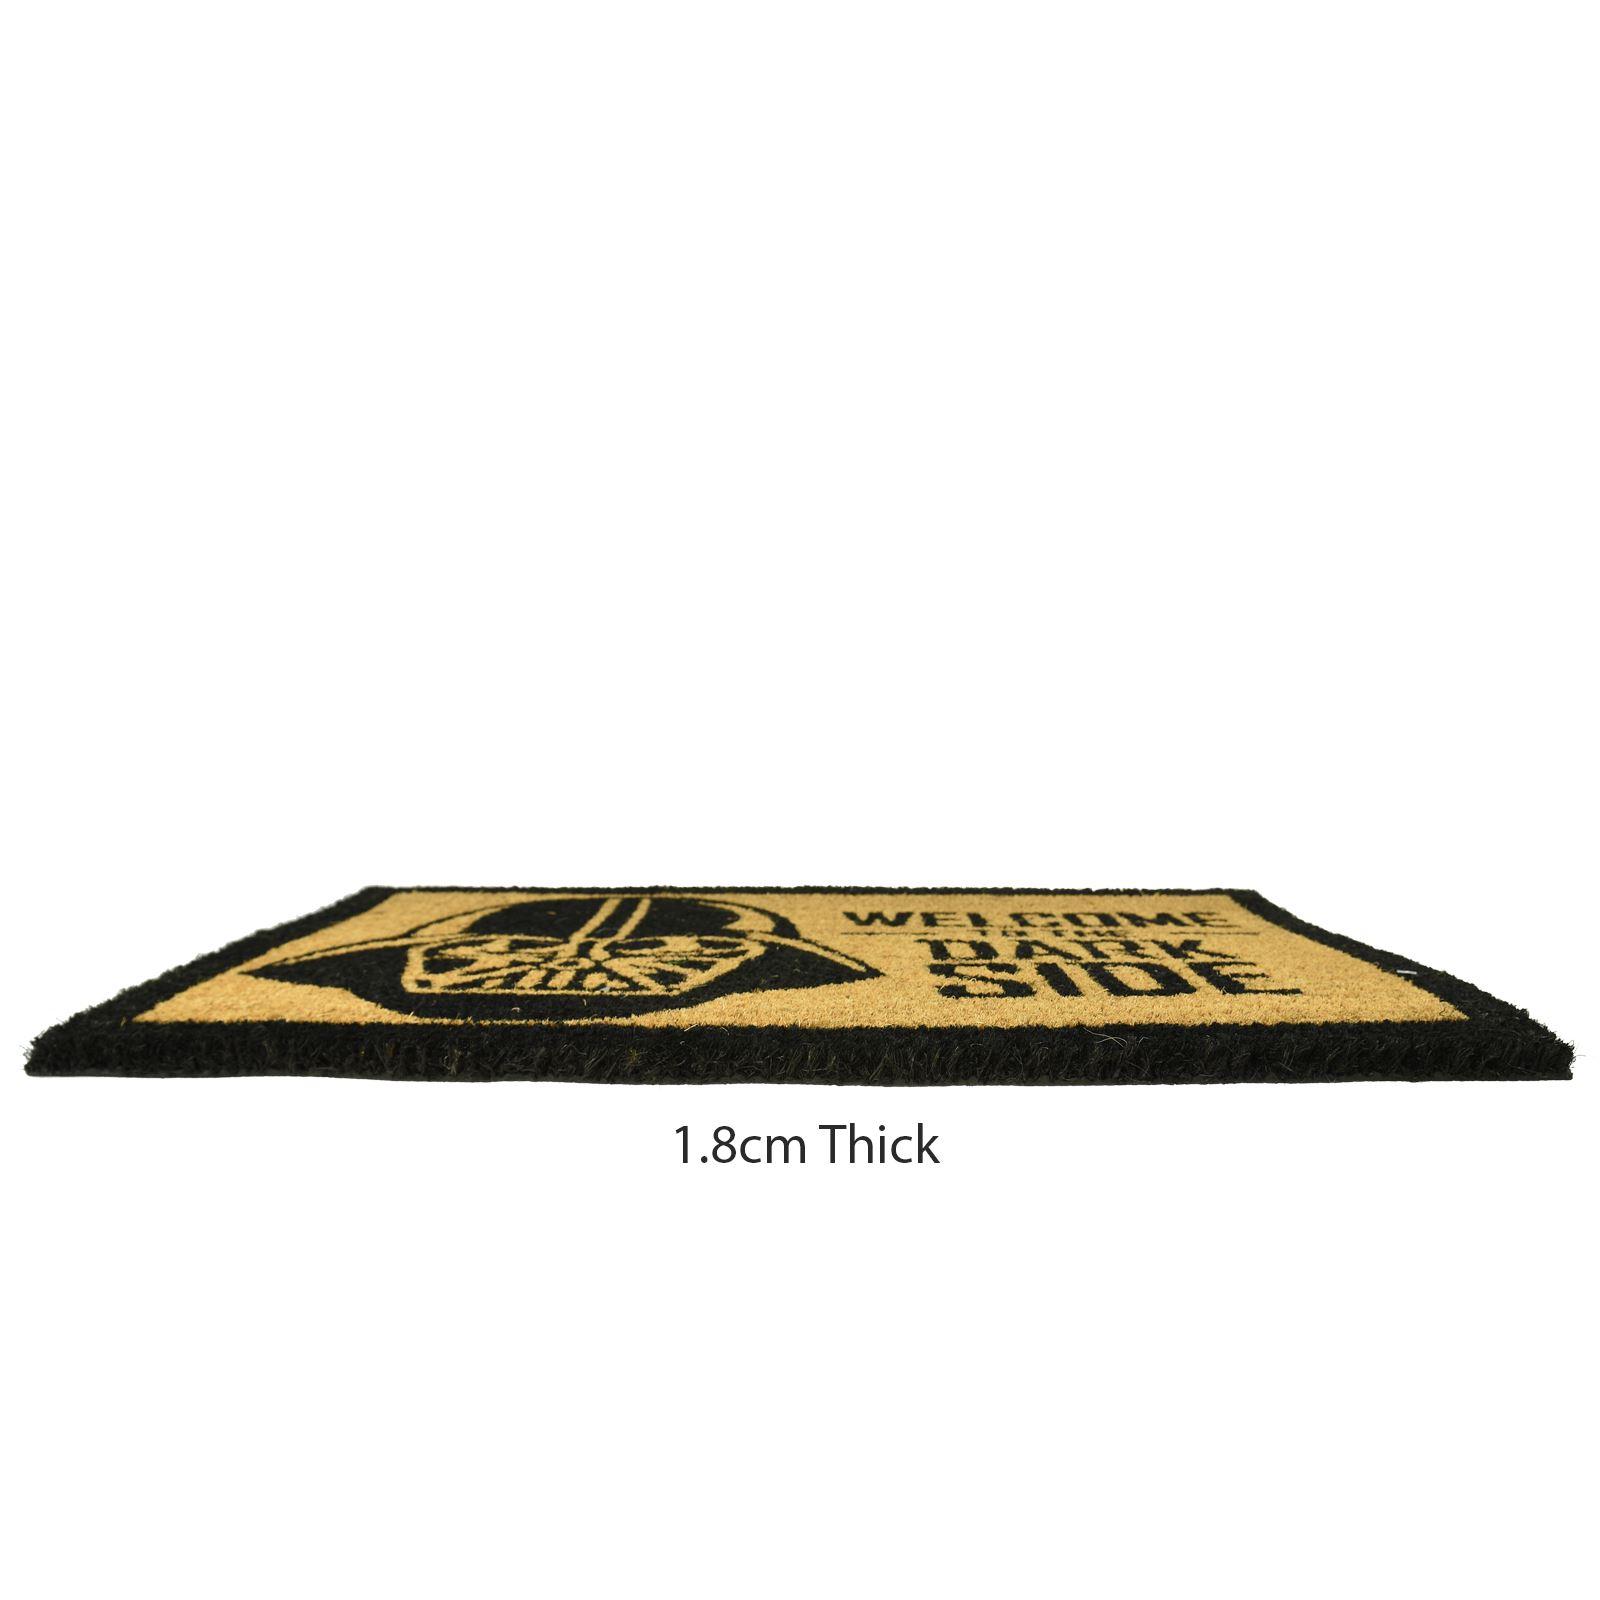 Plain-Non-Slip-Door-Mat-Tough-Natural-Coir-PVC-Back-Welcome-Doormat-40-x-60cm miniatura 38